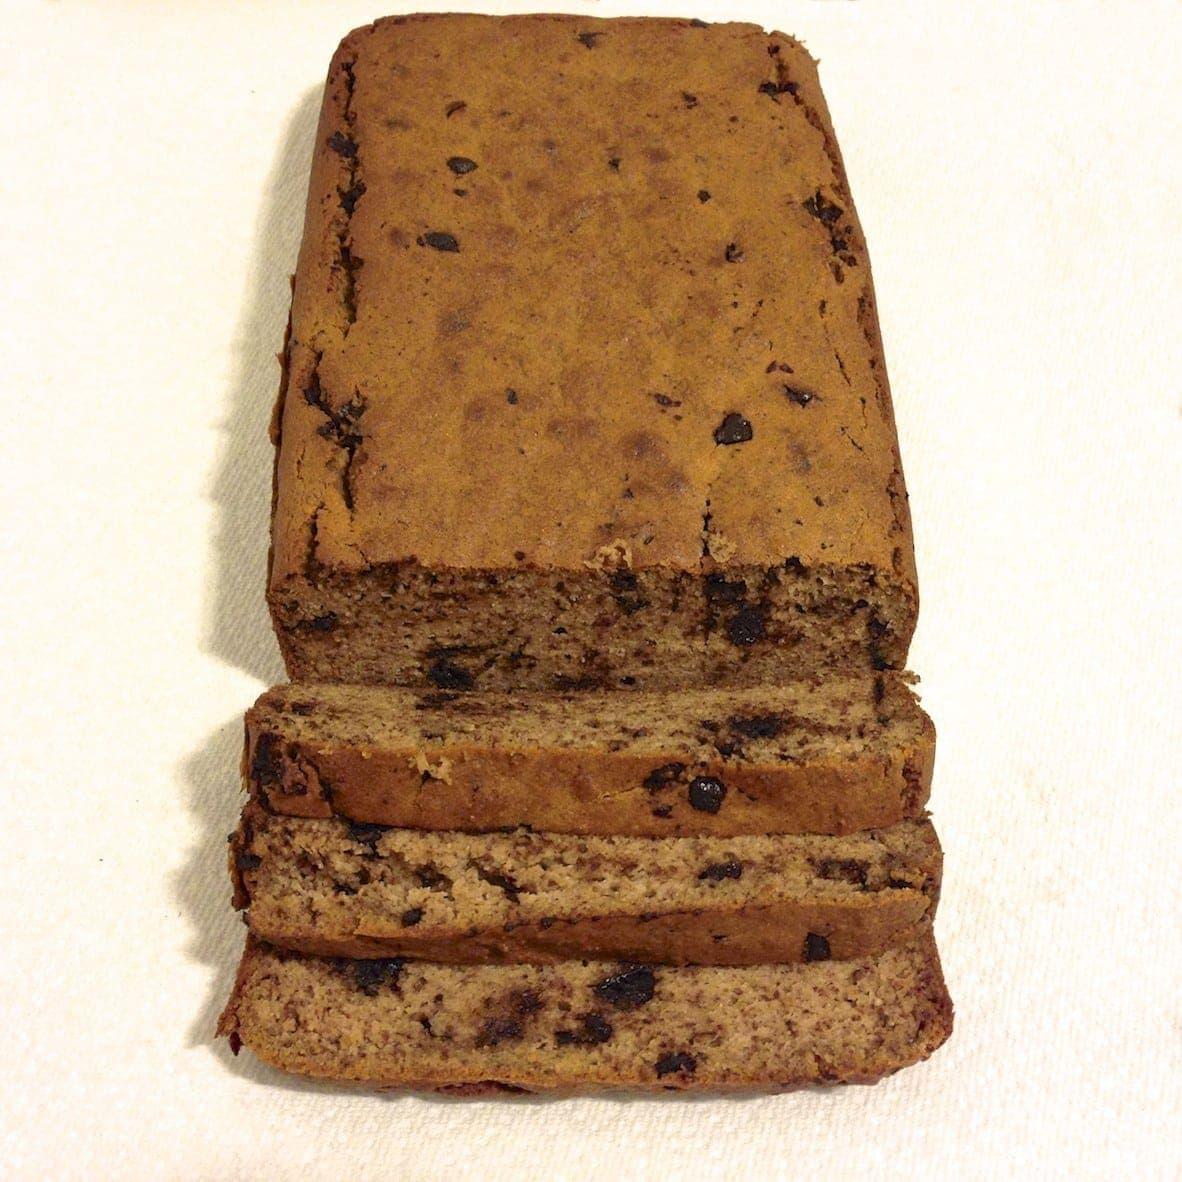 paleo chocolate chip banana loaf